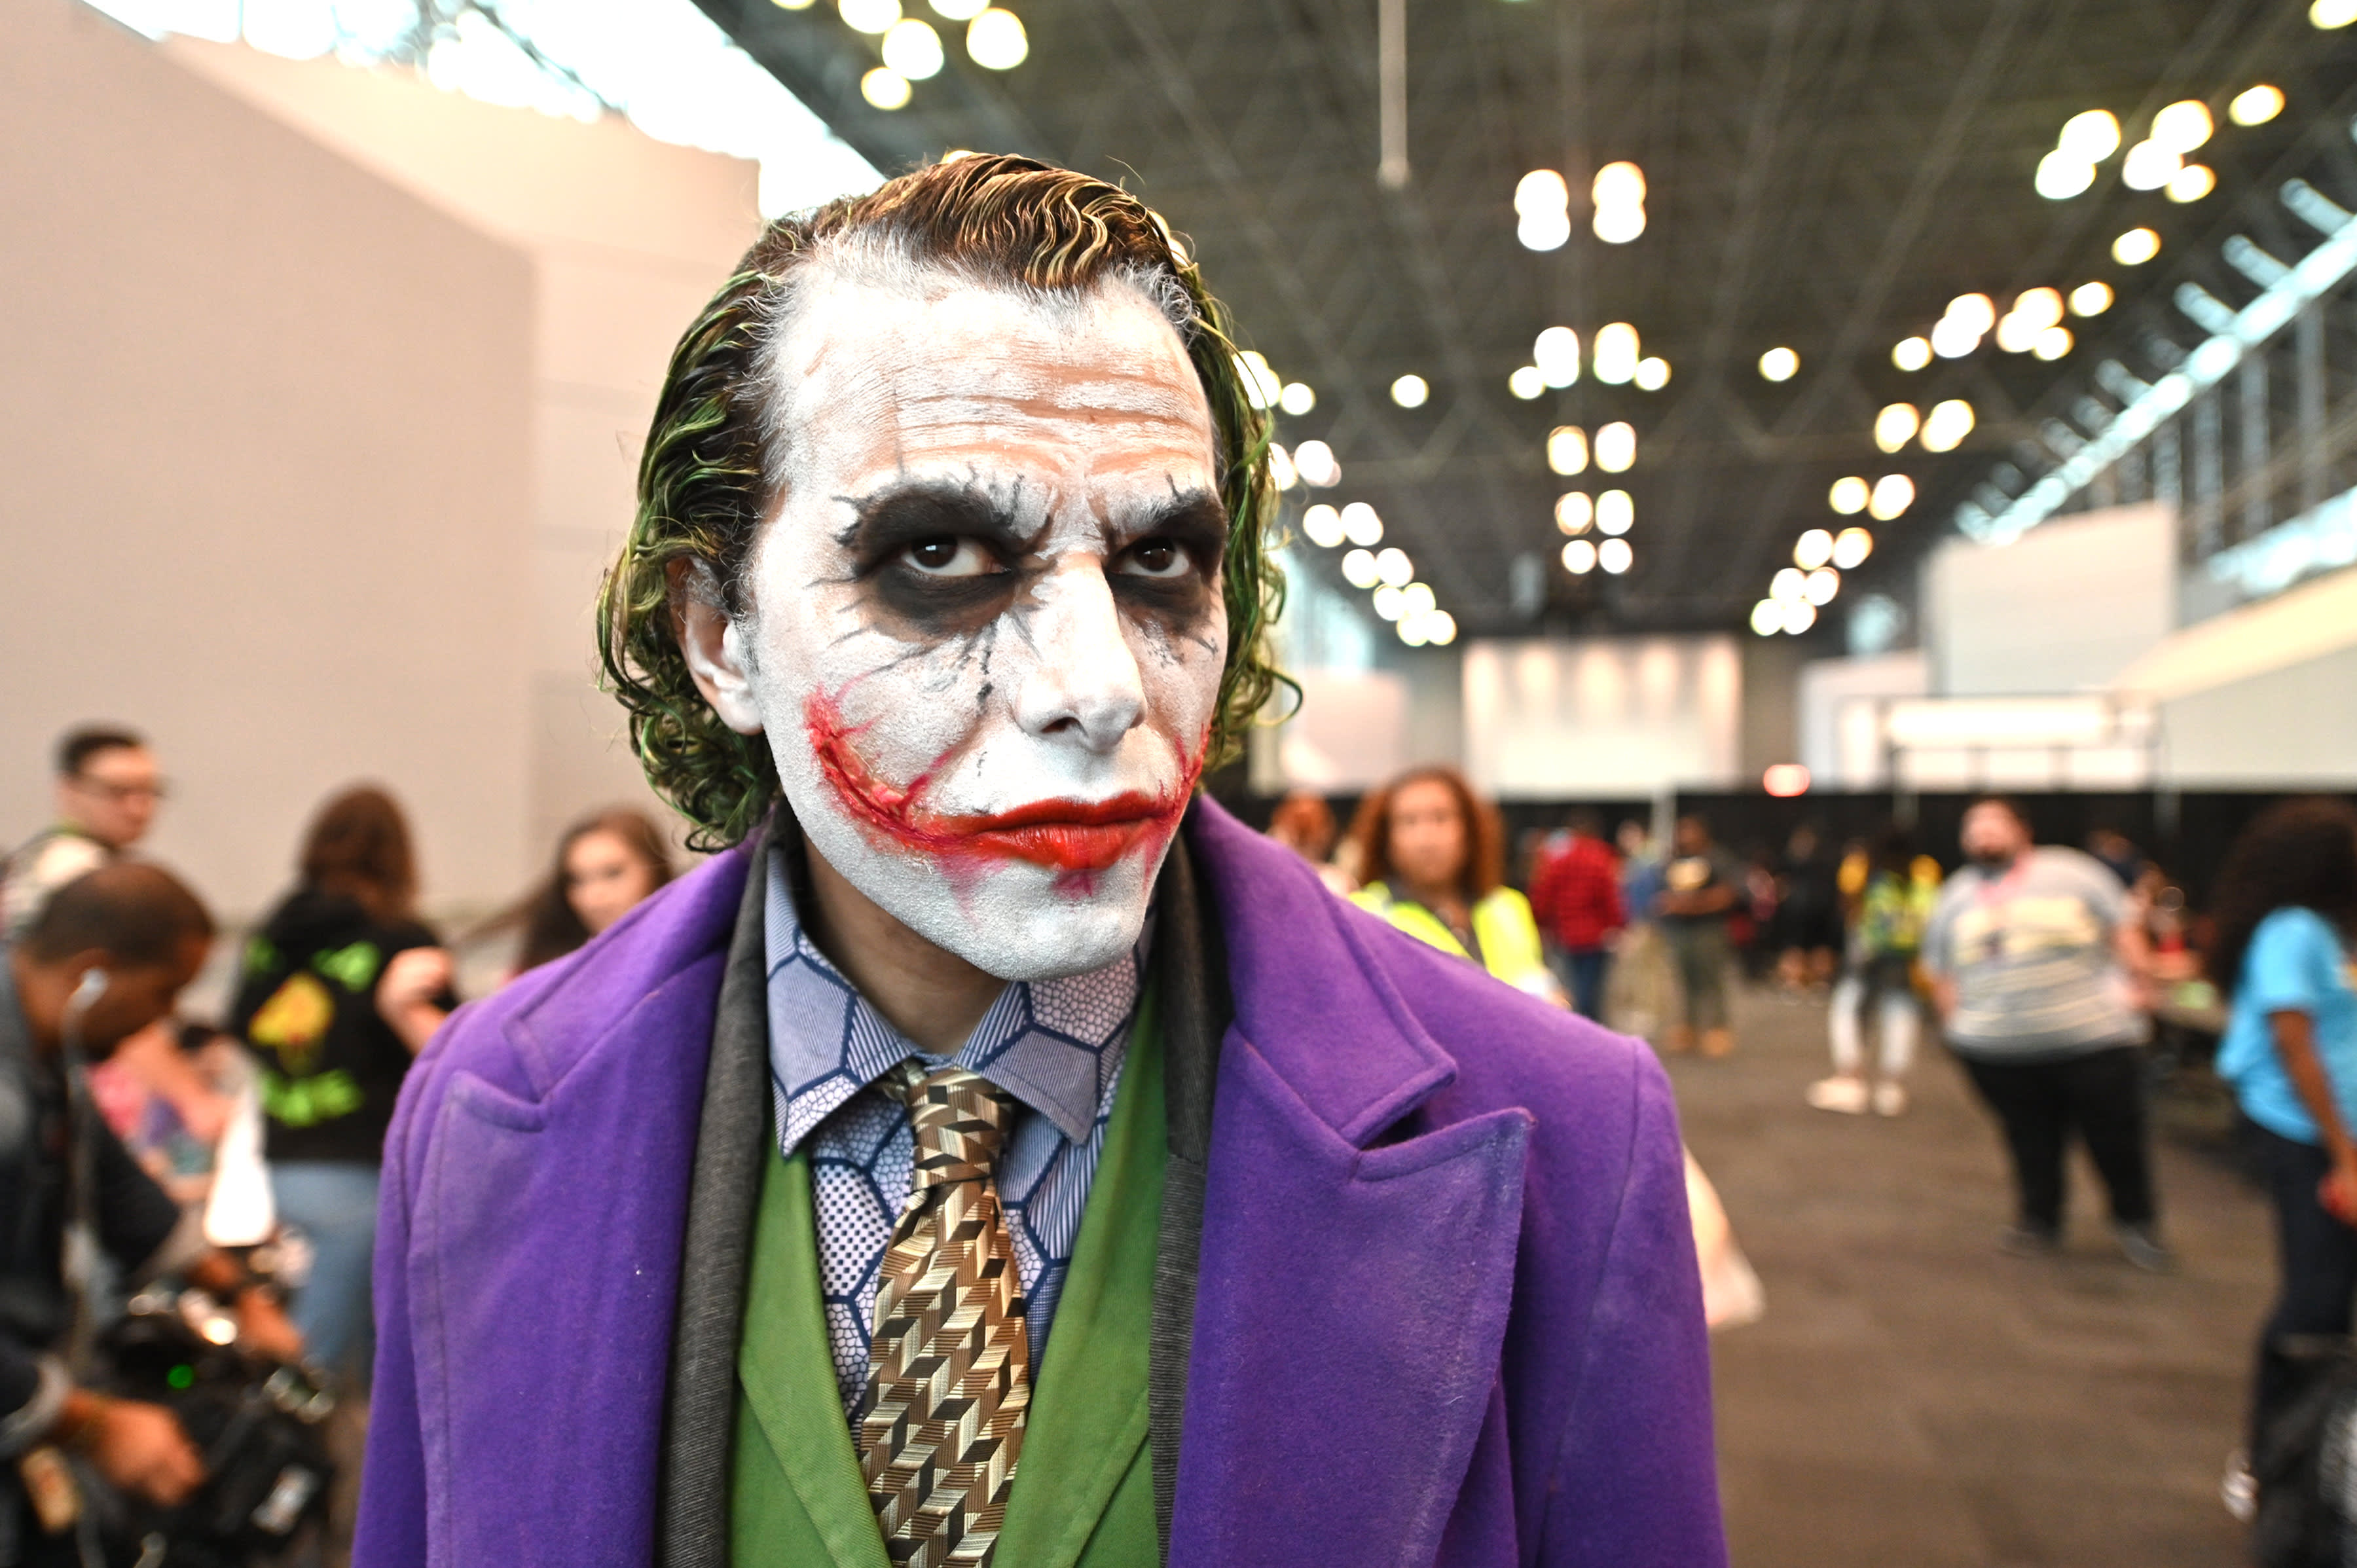 New York Comic Con 2020.Reedpop The Company Behind New York Comic Con Has Big Plans